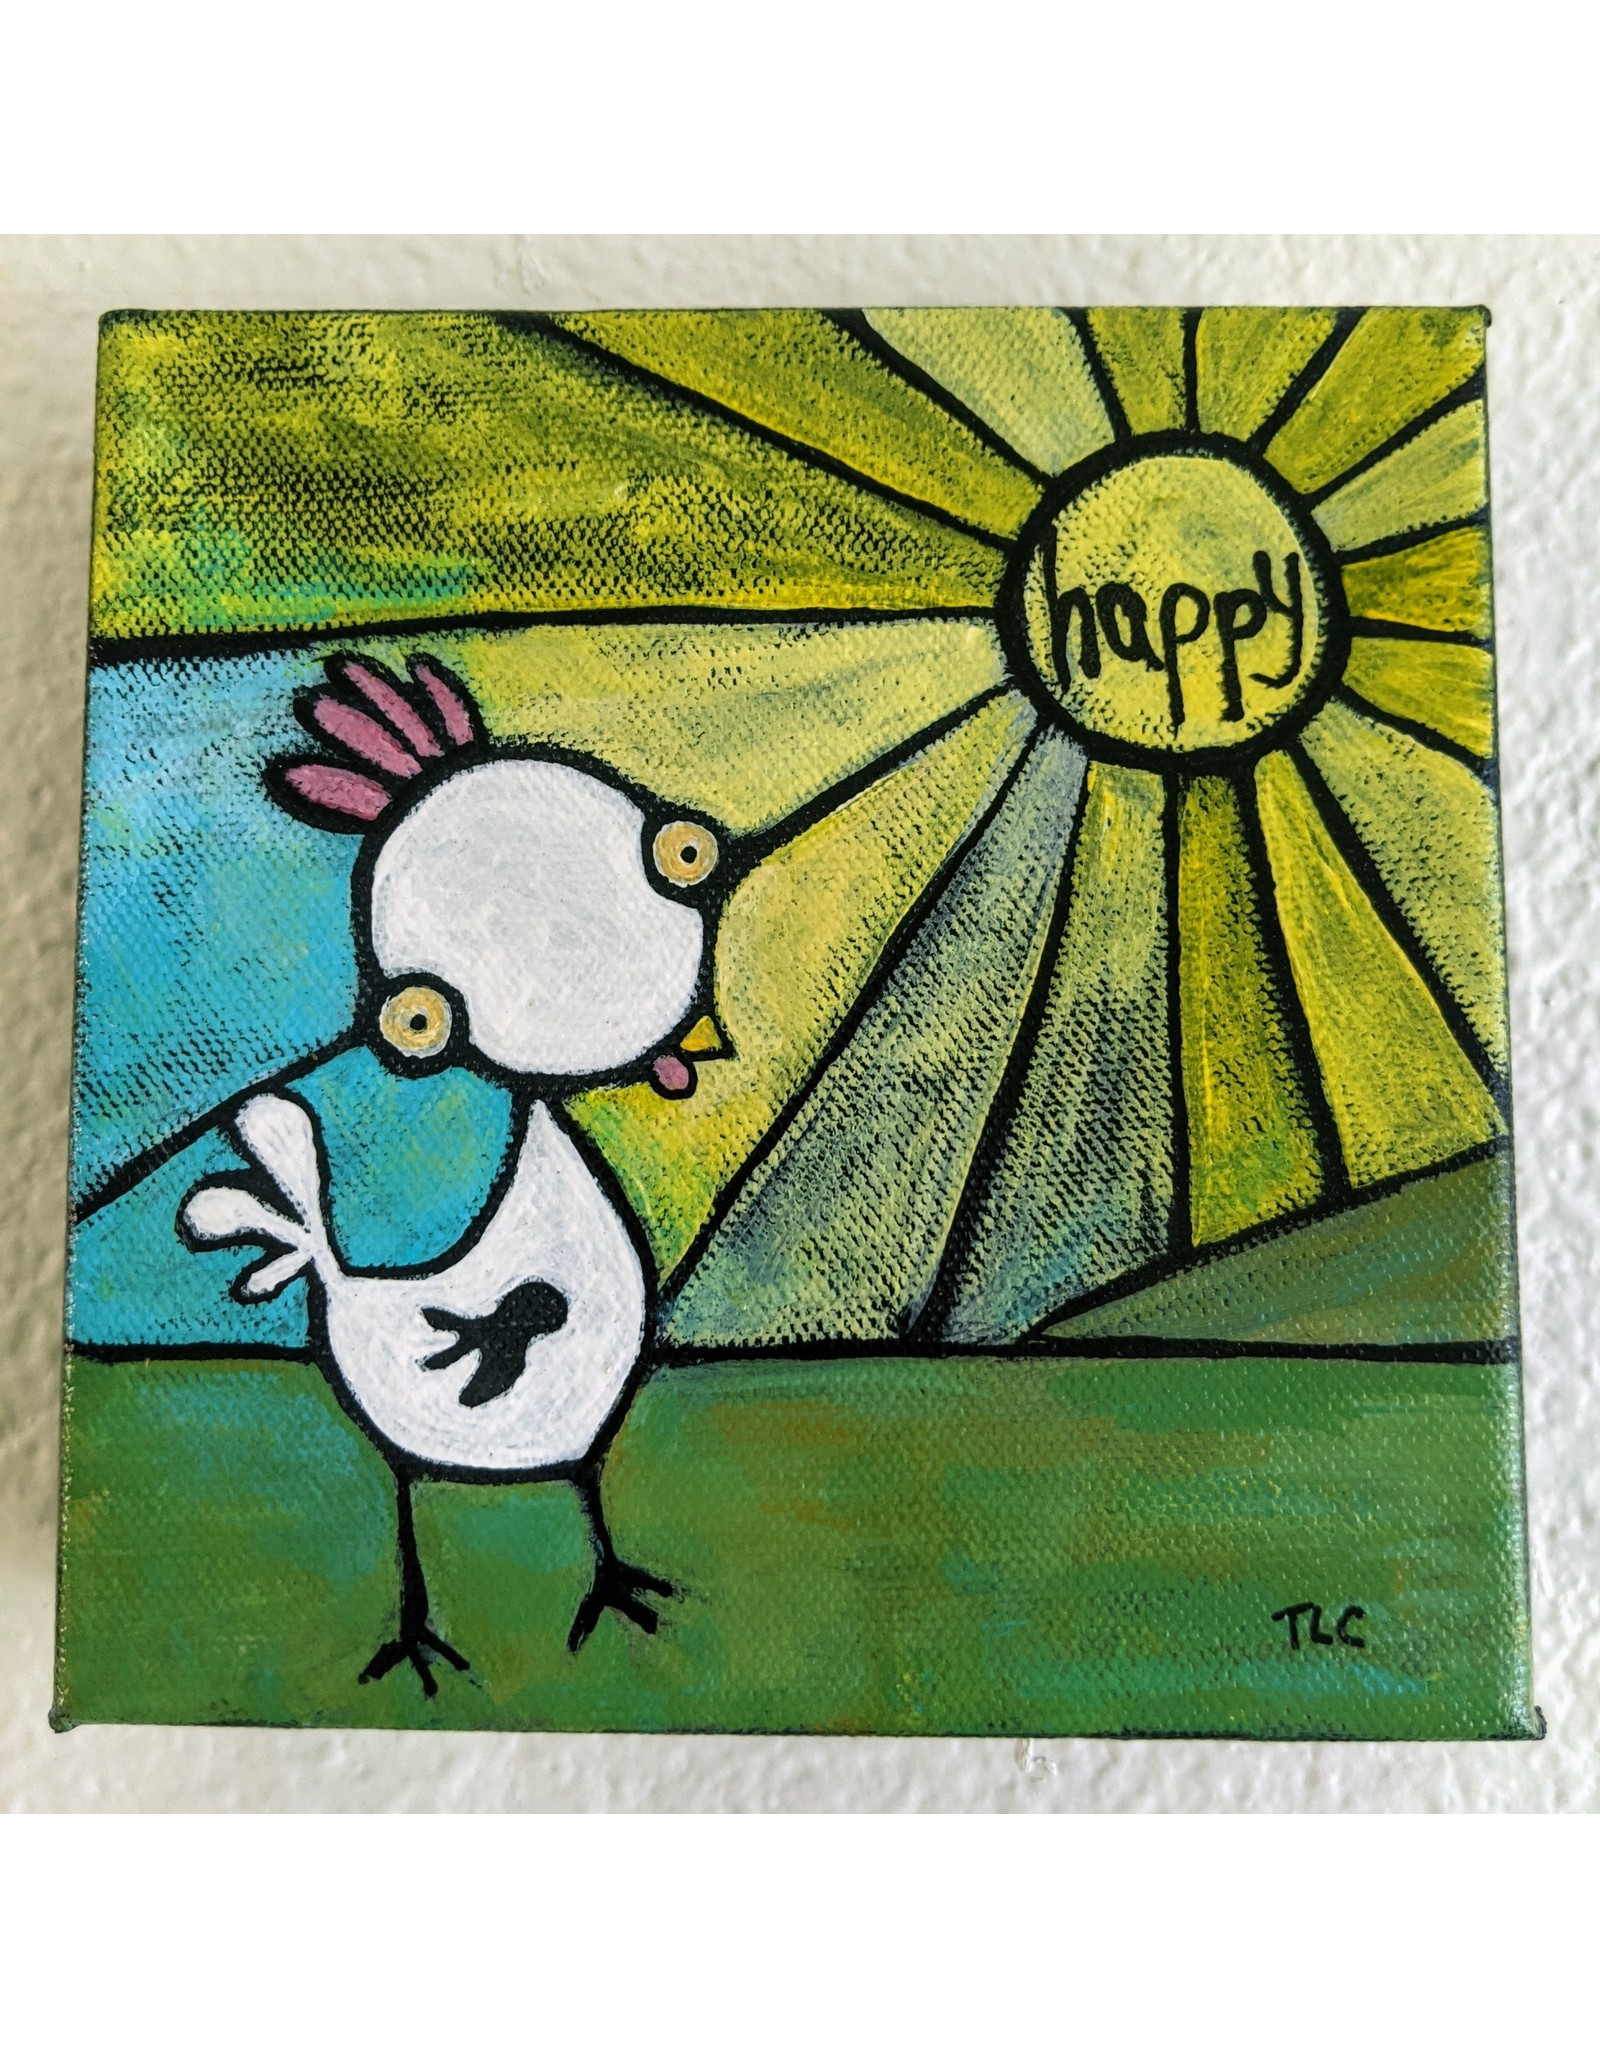 Inspire Farms Inspire Farms Original Art - Happy Guy